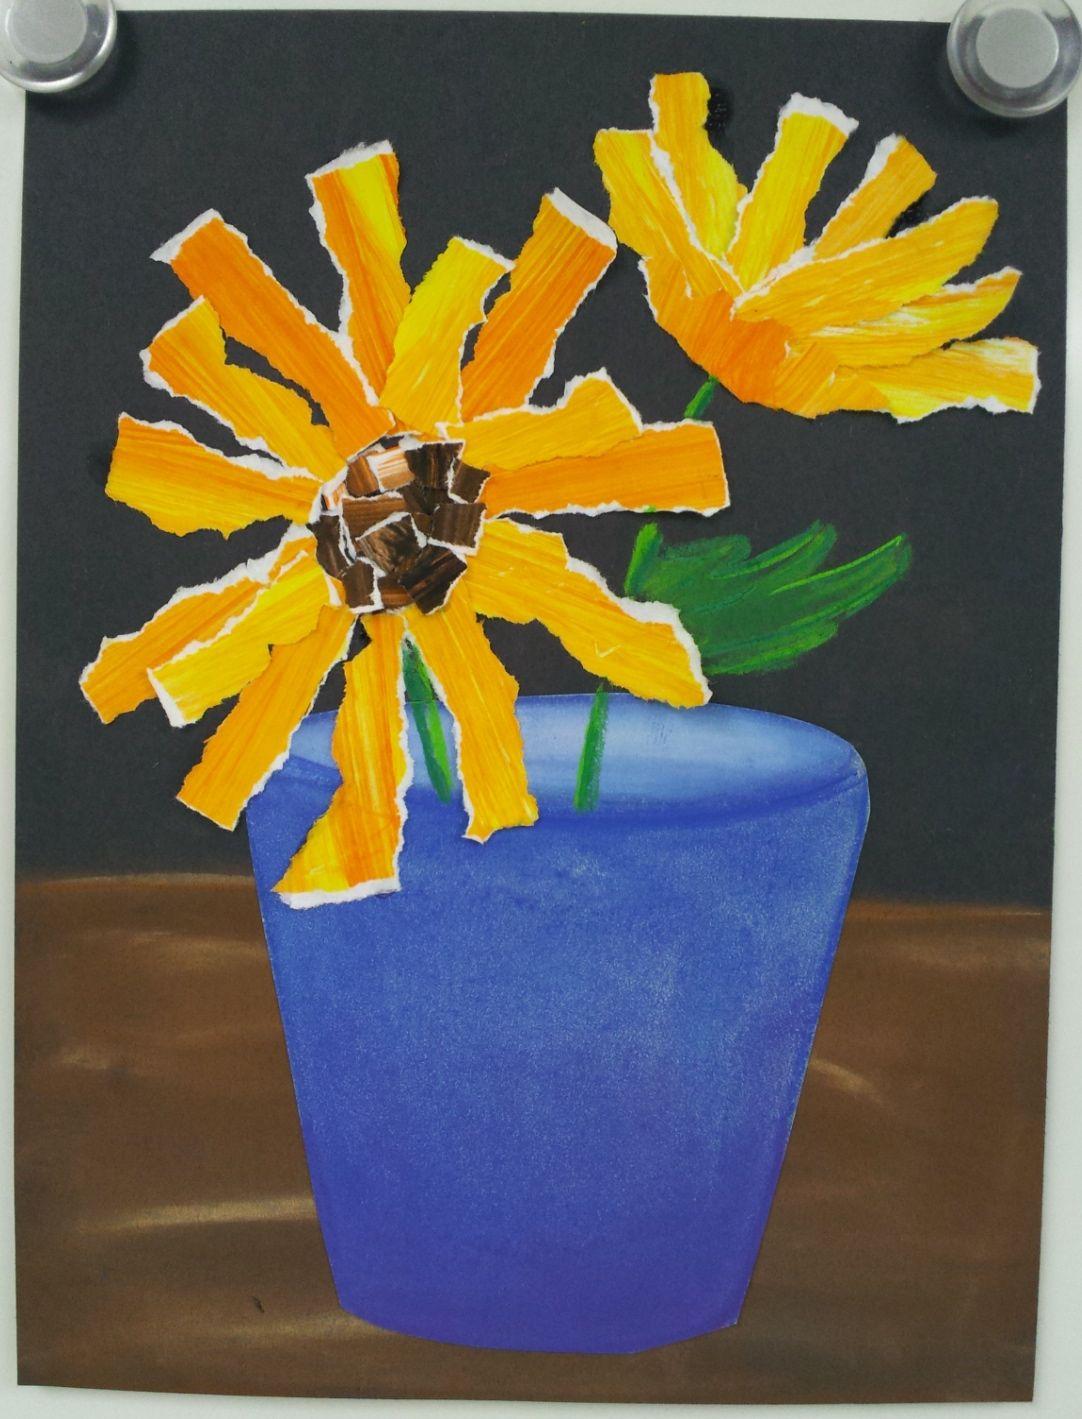 Van Gogh Sunflowers 2nd